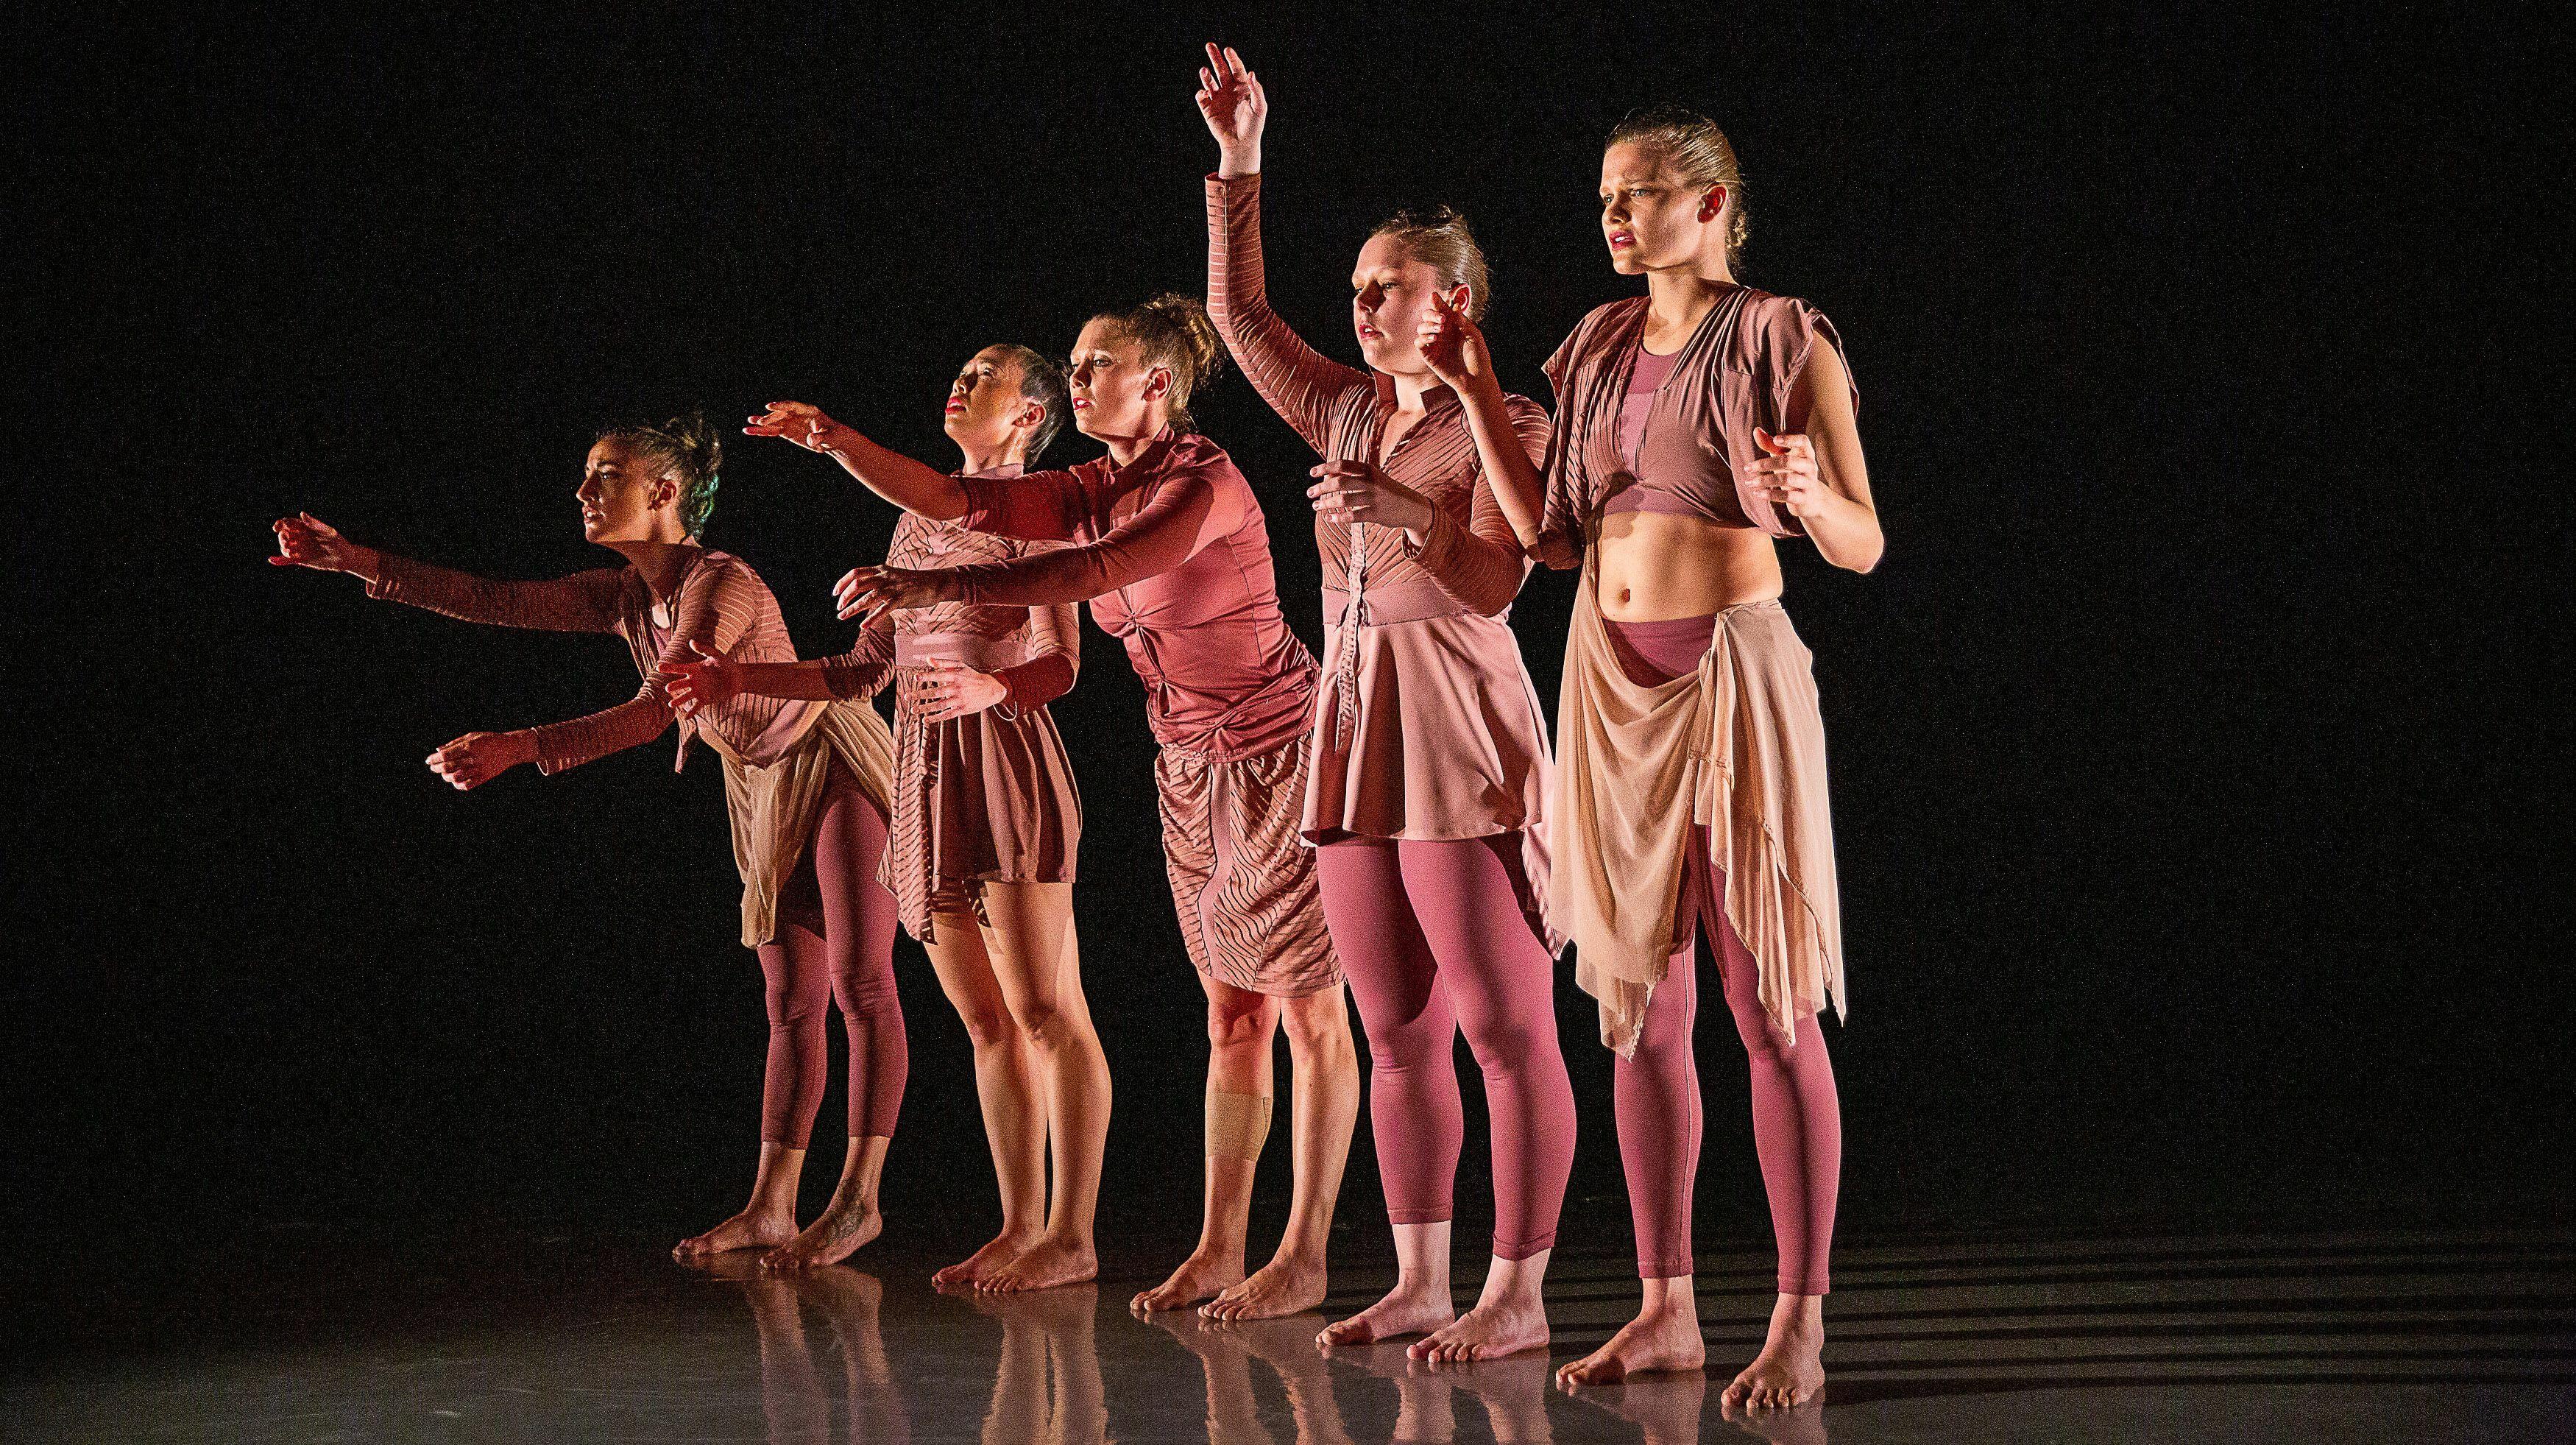 Ariel Rivka Dance & Guests